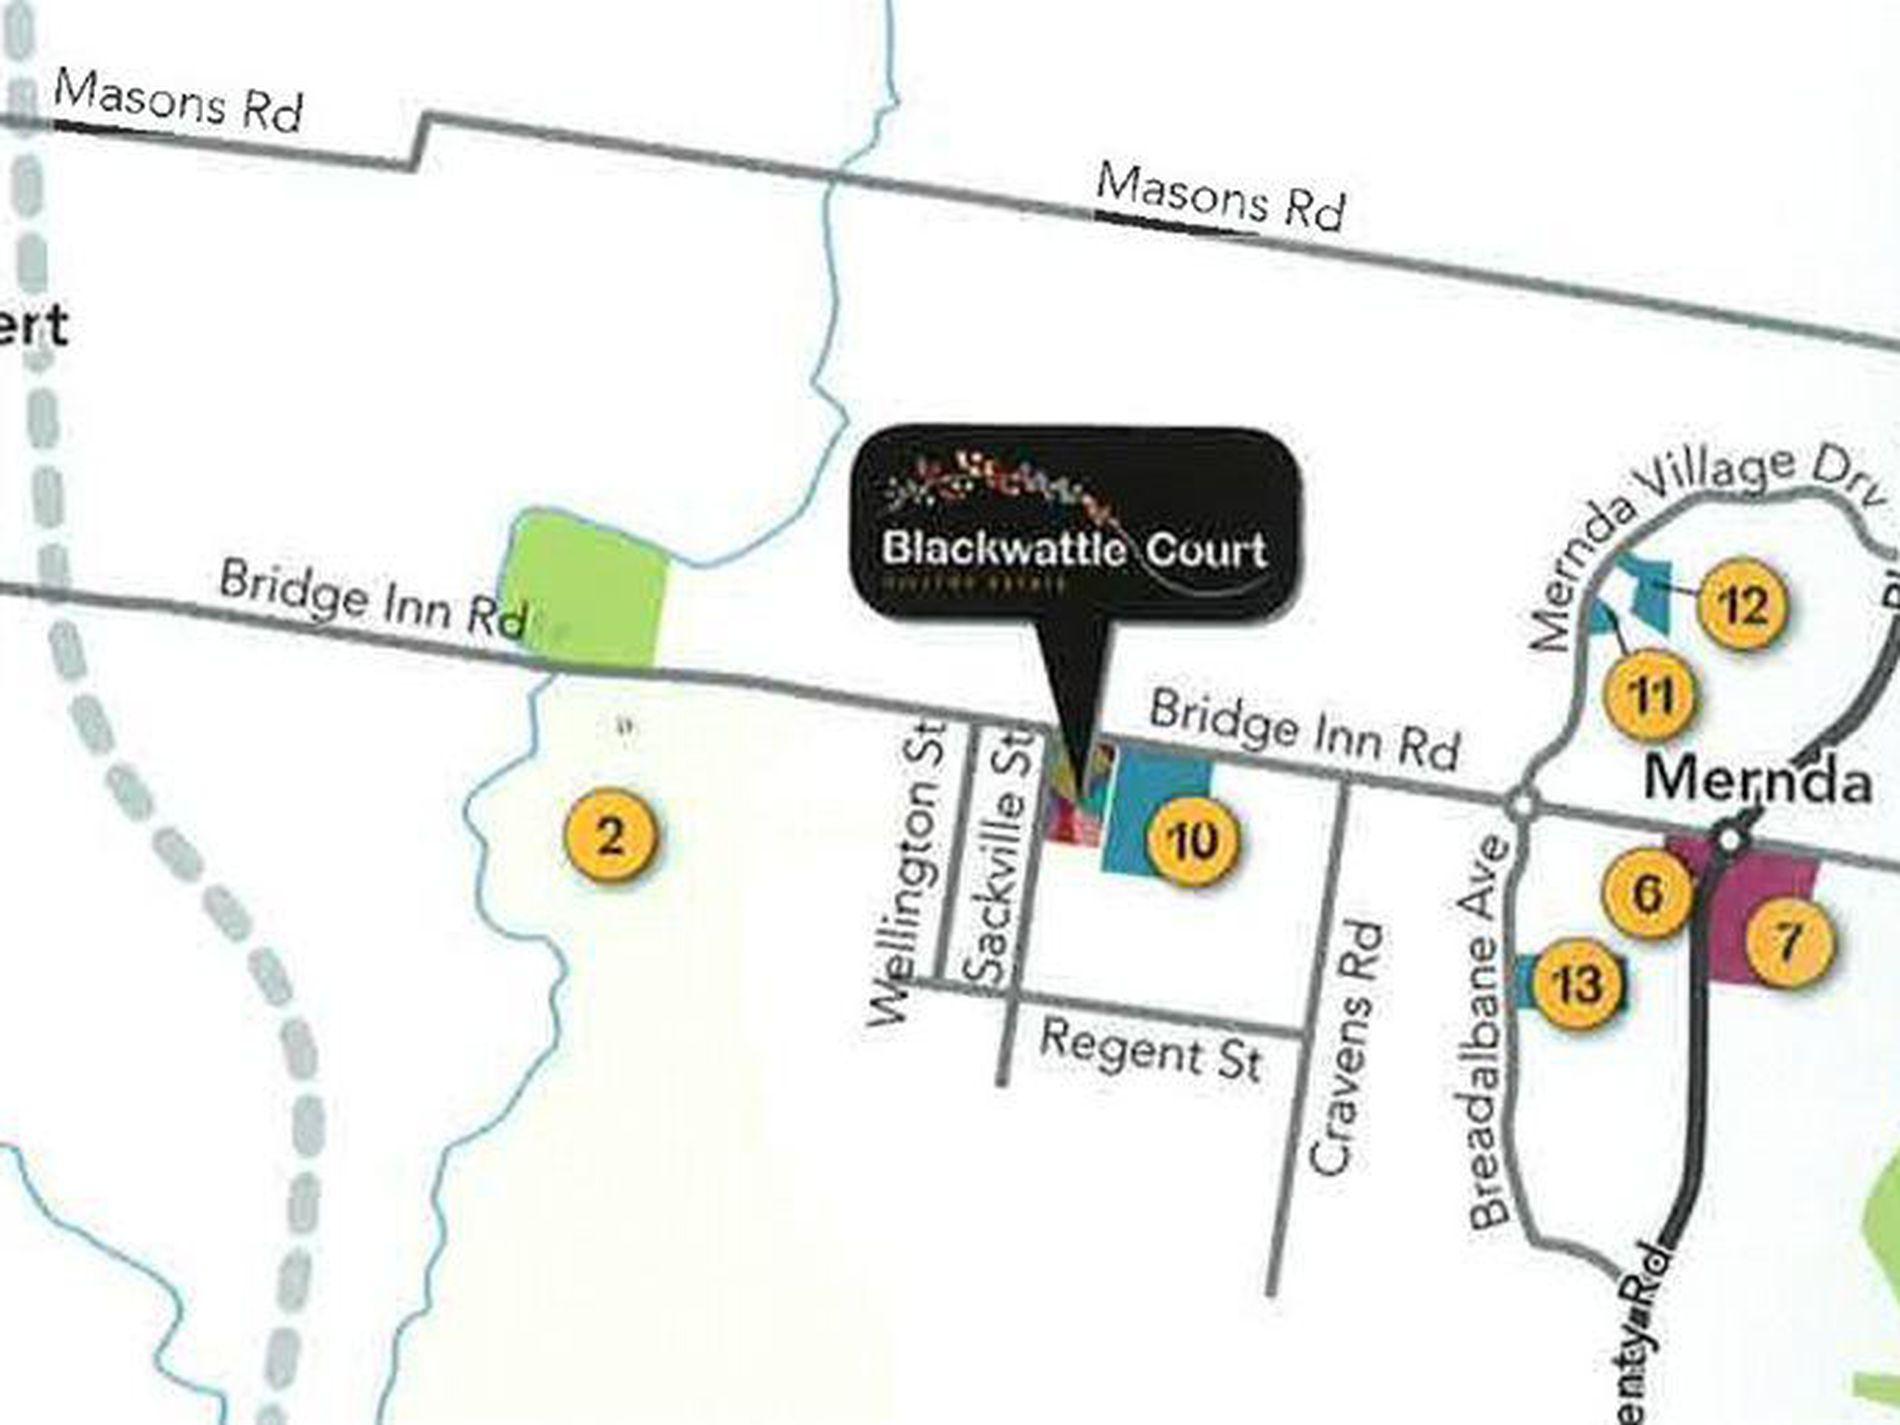 22 Blackwattle Court, Mernda